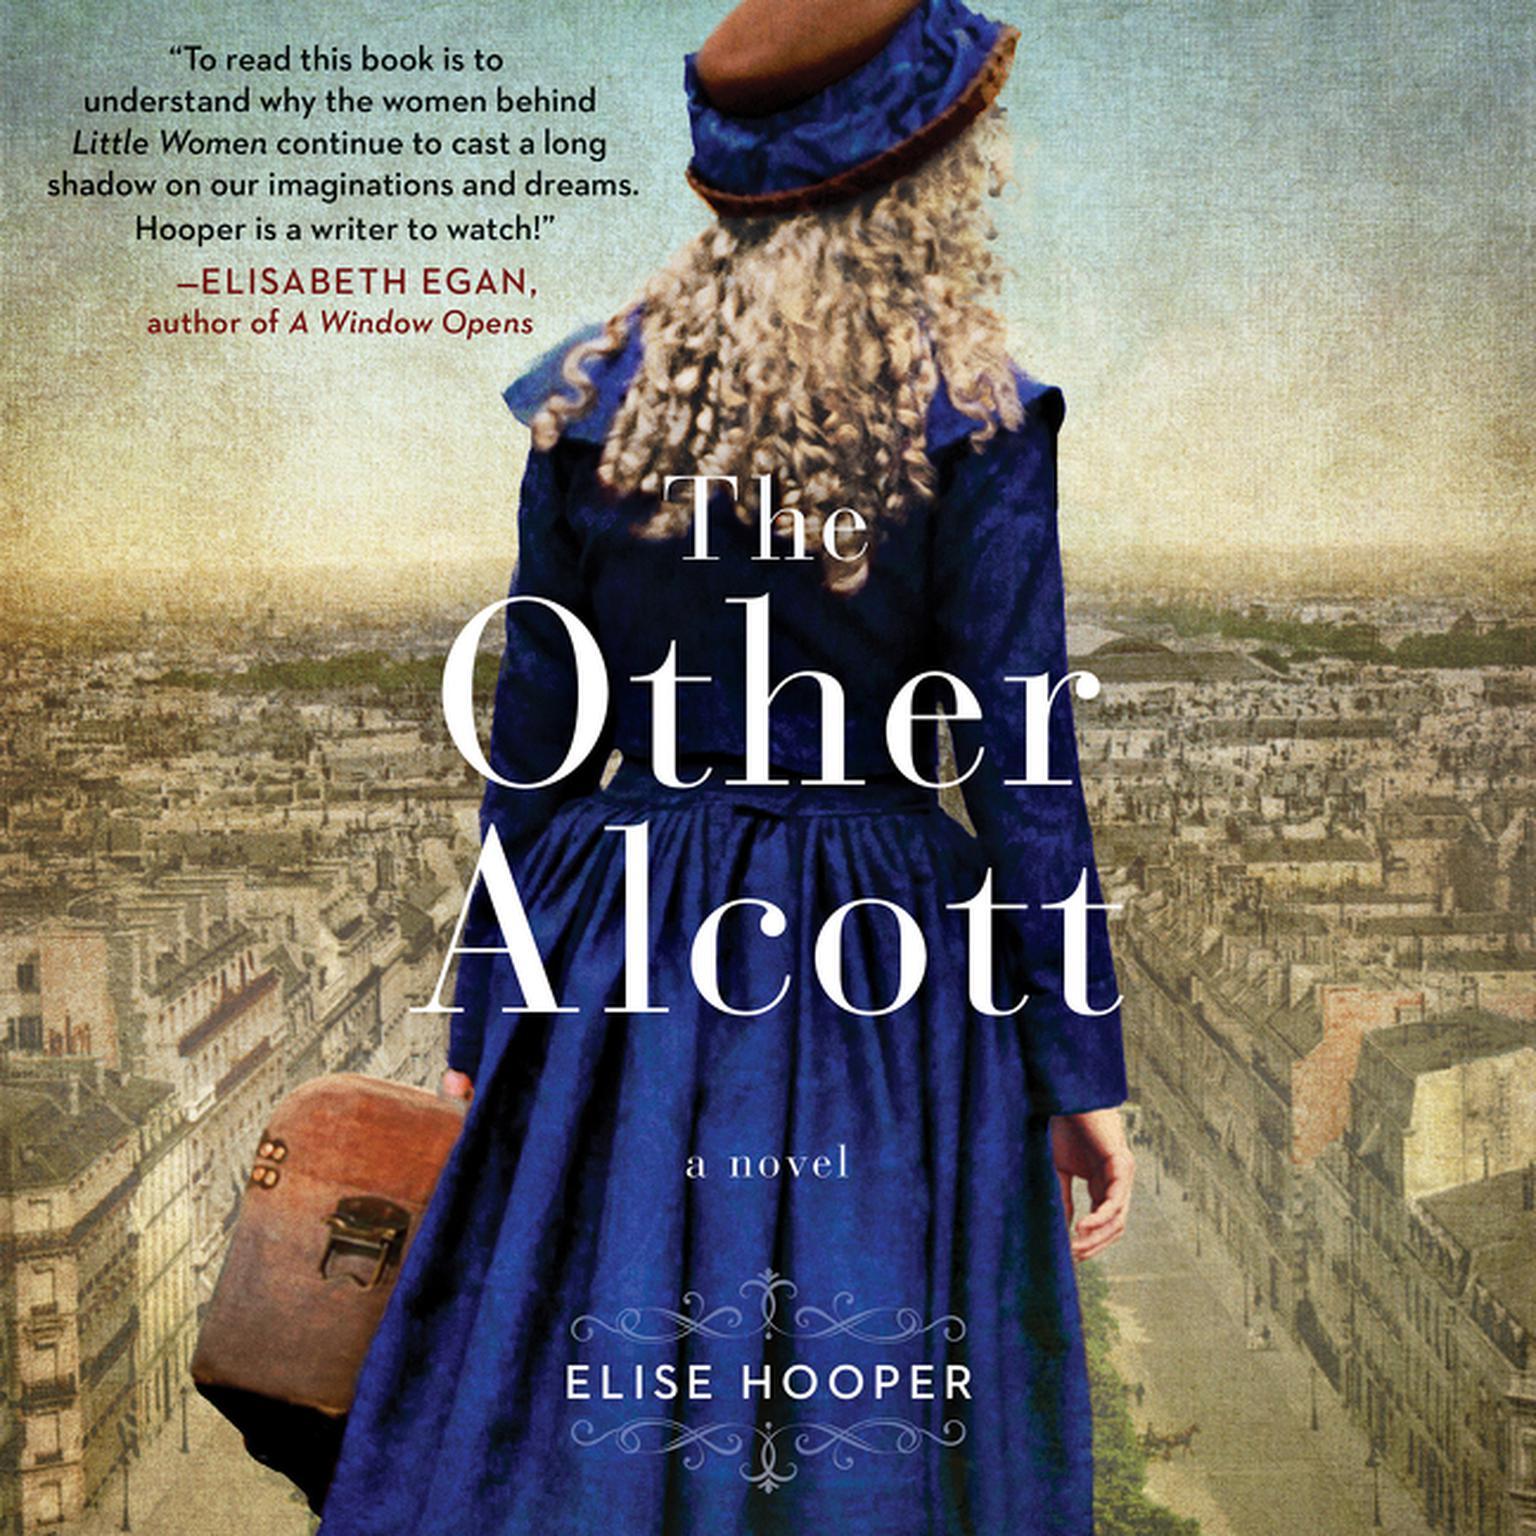 The Other Alcott: A Novel Audiobook, by Elise Hooper